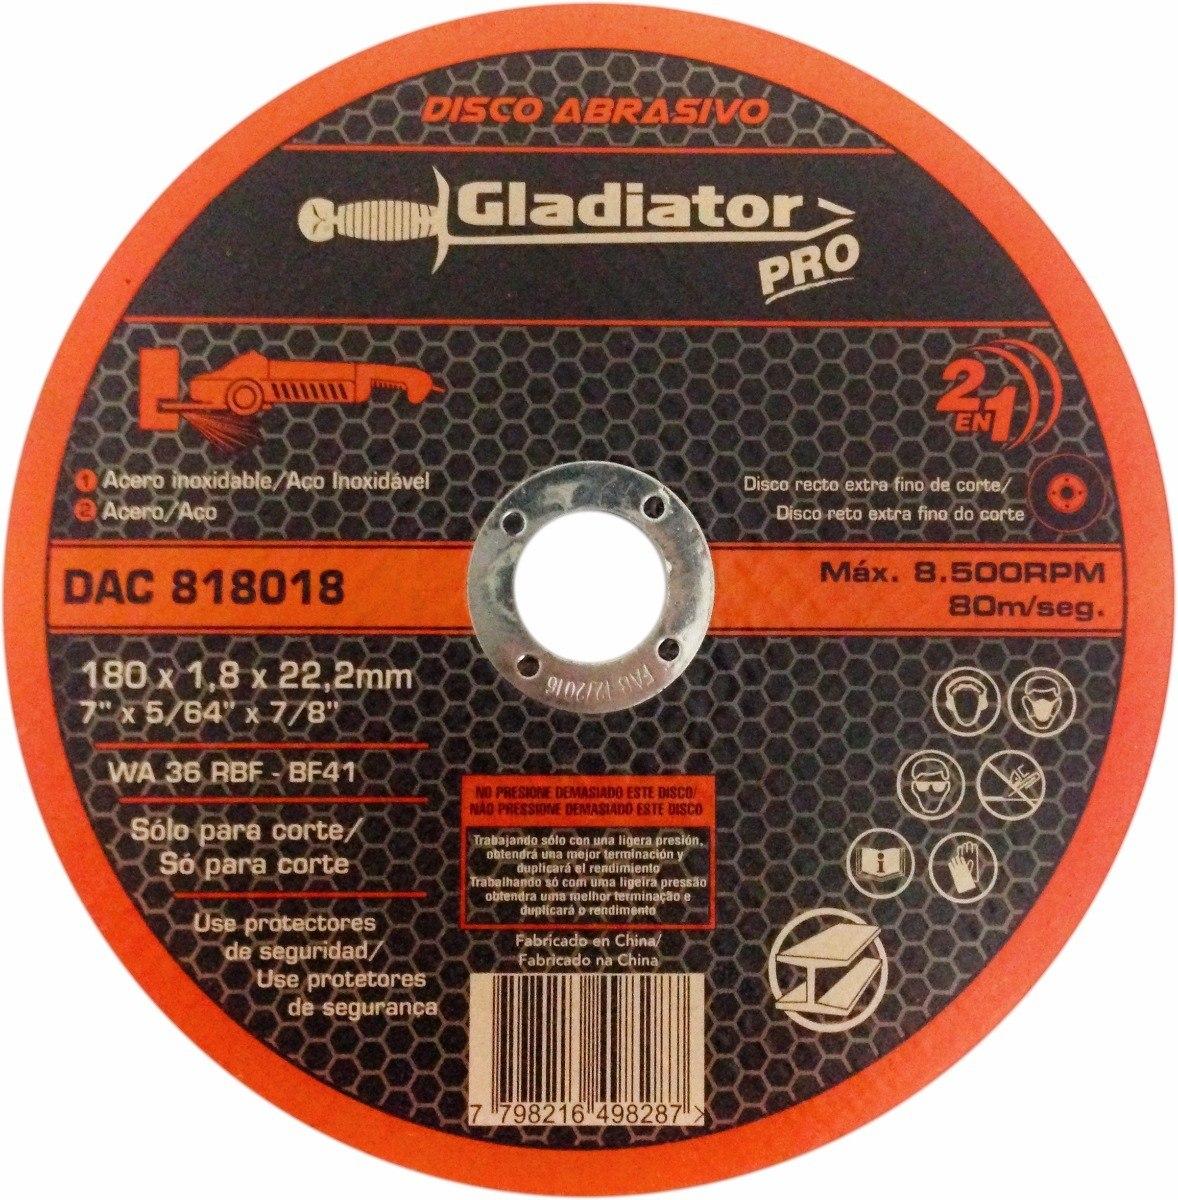 Gladiator Pro7